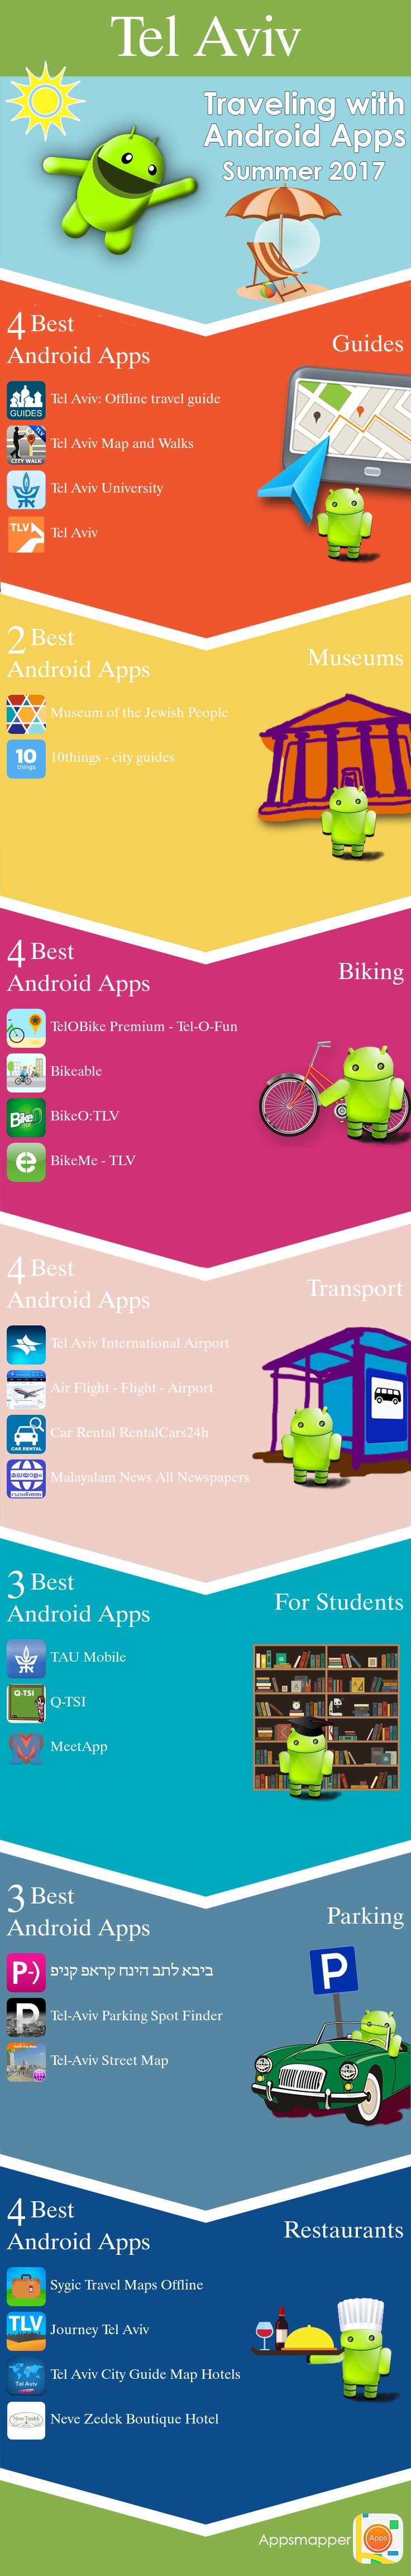 Tel Aviv Android apps Travel Guides Maps Transportation Biking